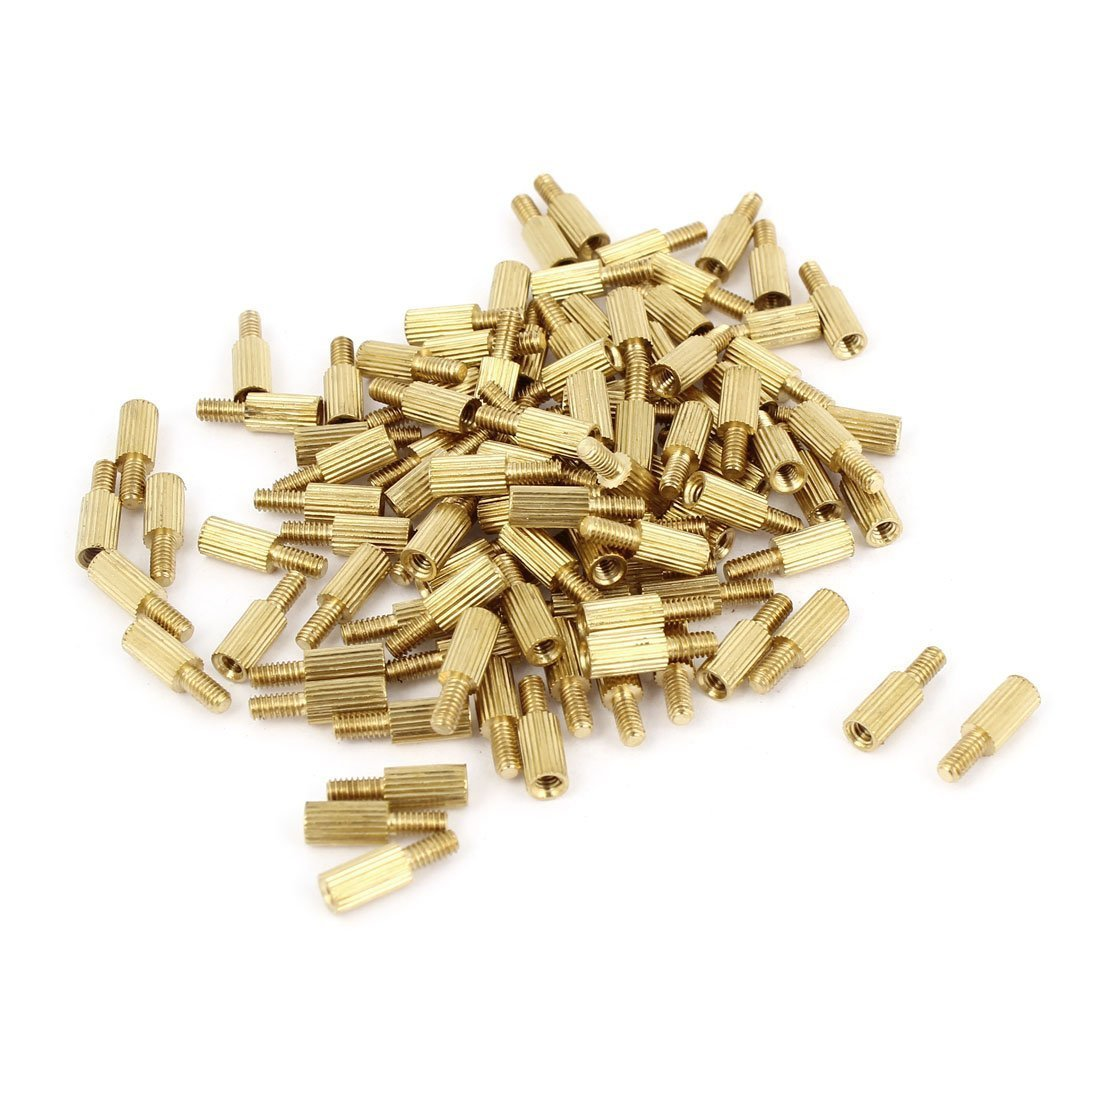 uxcell Male to Female Threaded PCB Board Brass Pillars Standoff M2x6mm 100Pcs a14082100ux0061